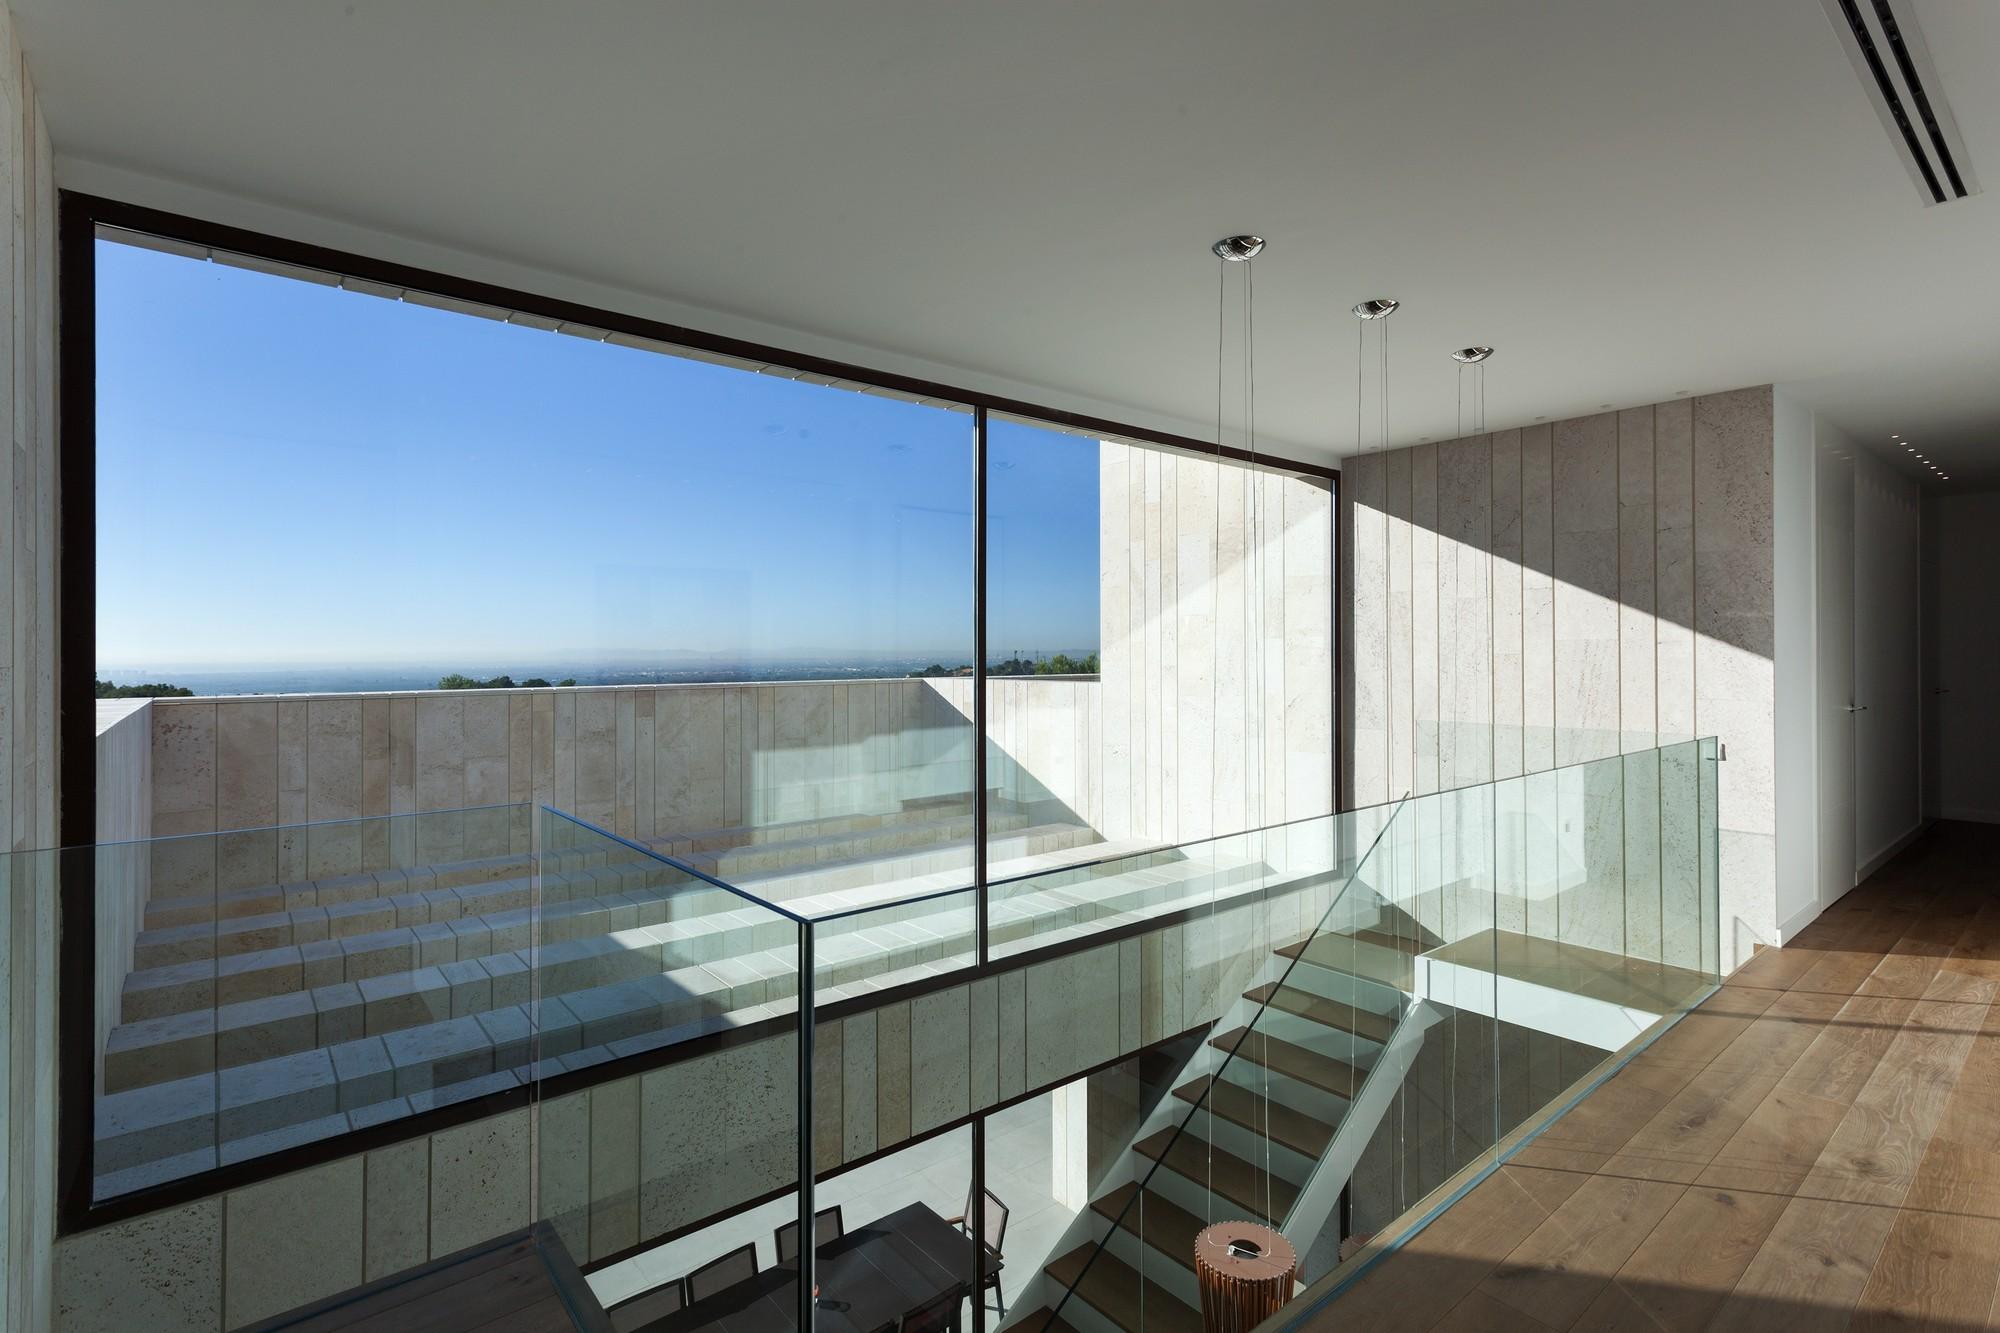 Gallery of monasterios house antonio altarriba comes 5 for Minimalist house design 36 72